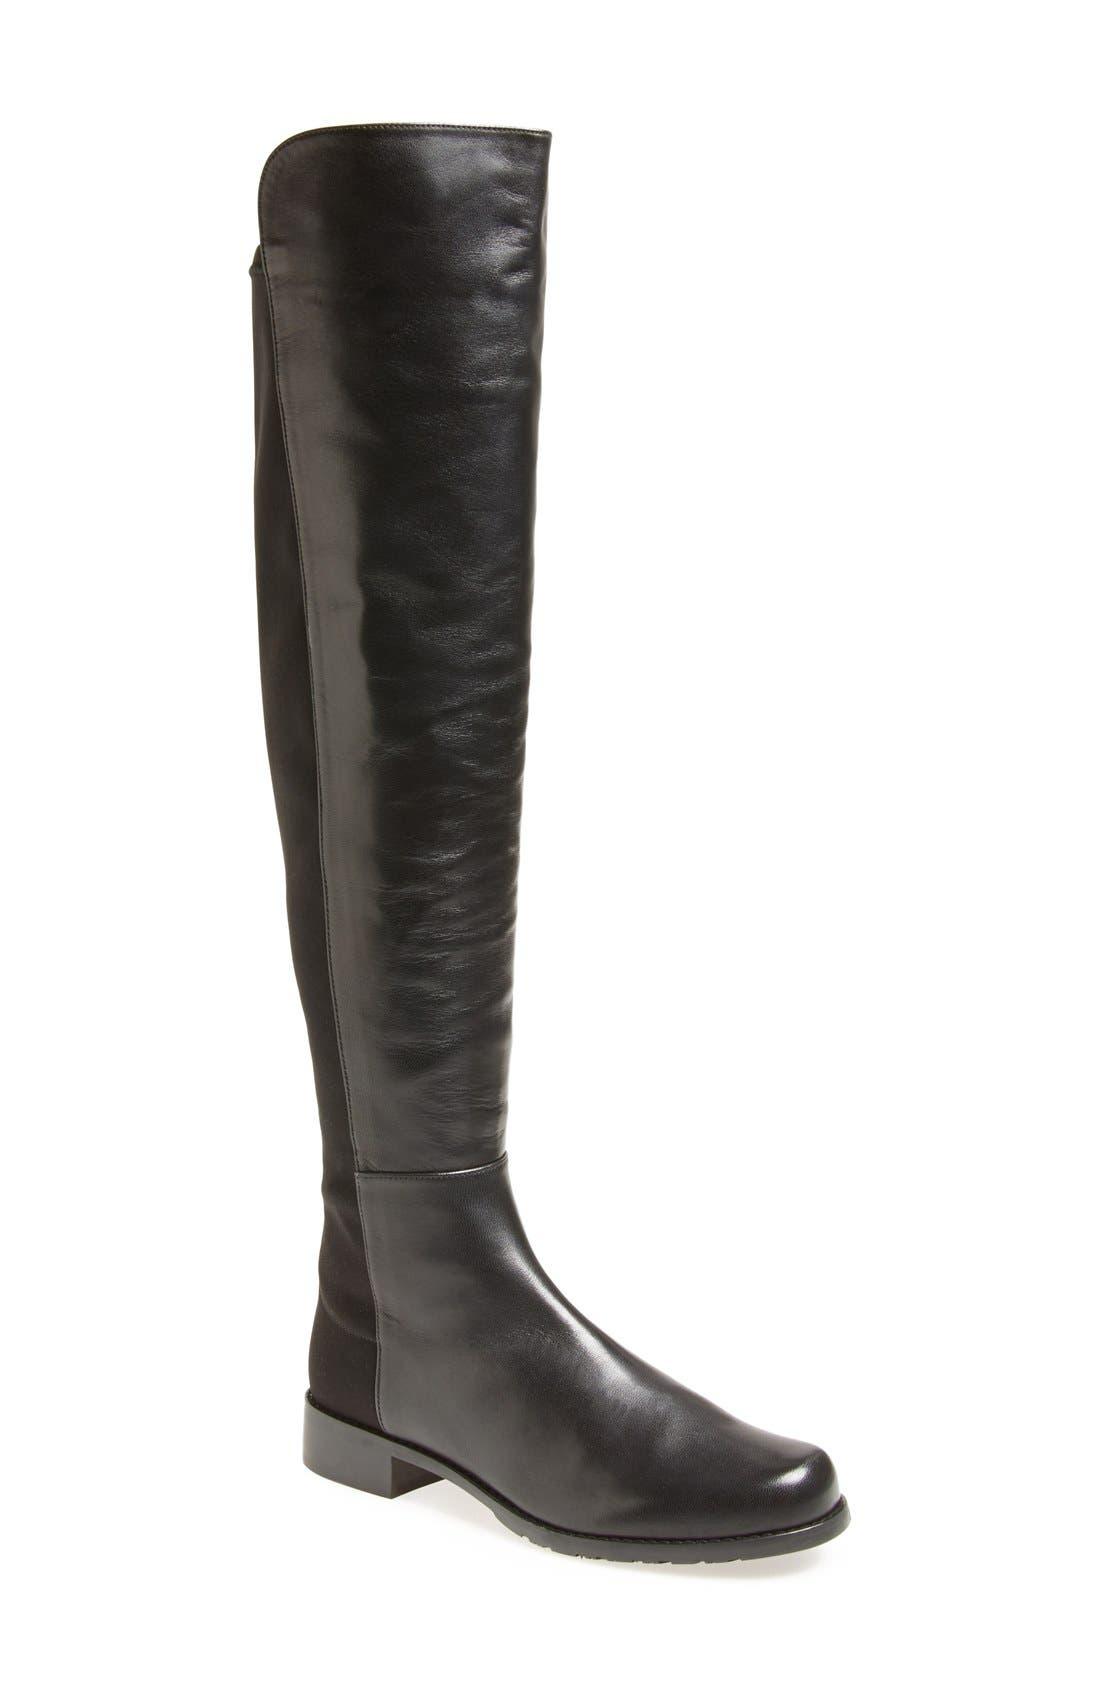 Alternate Image 1 Selected - Stuart Weitzman 5050 Over the Knee Leather Boot (Women)